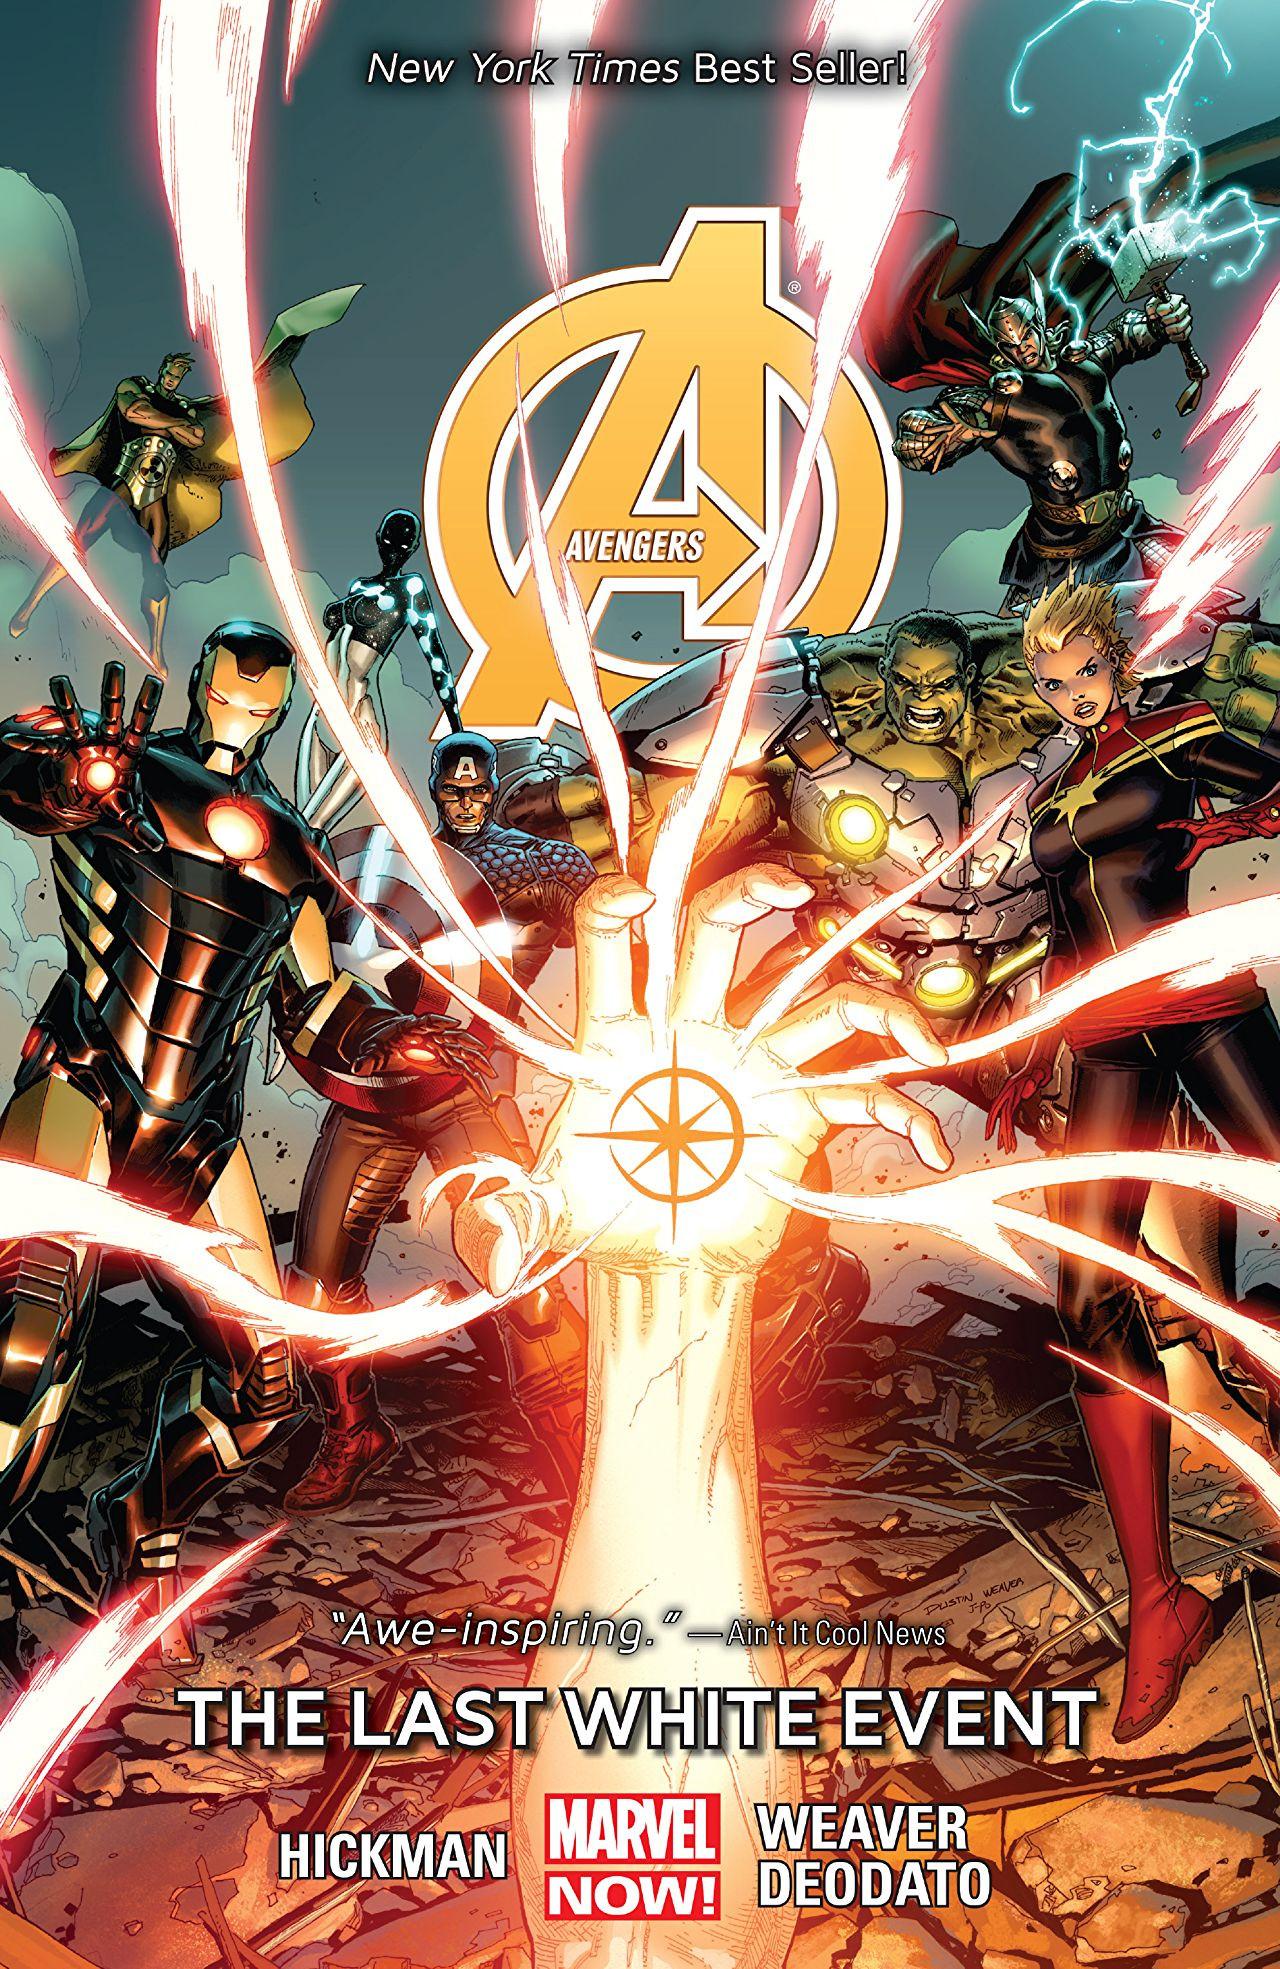 Avengers TPB Vol 5 2: The Last White Event